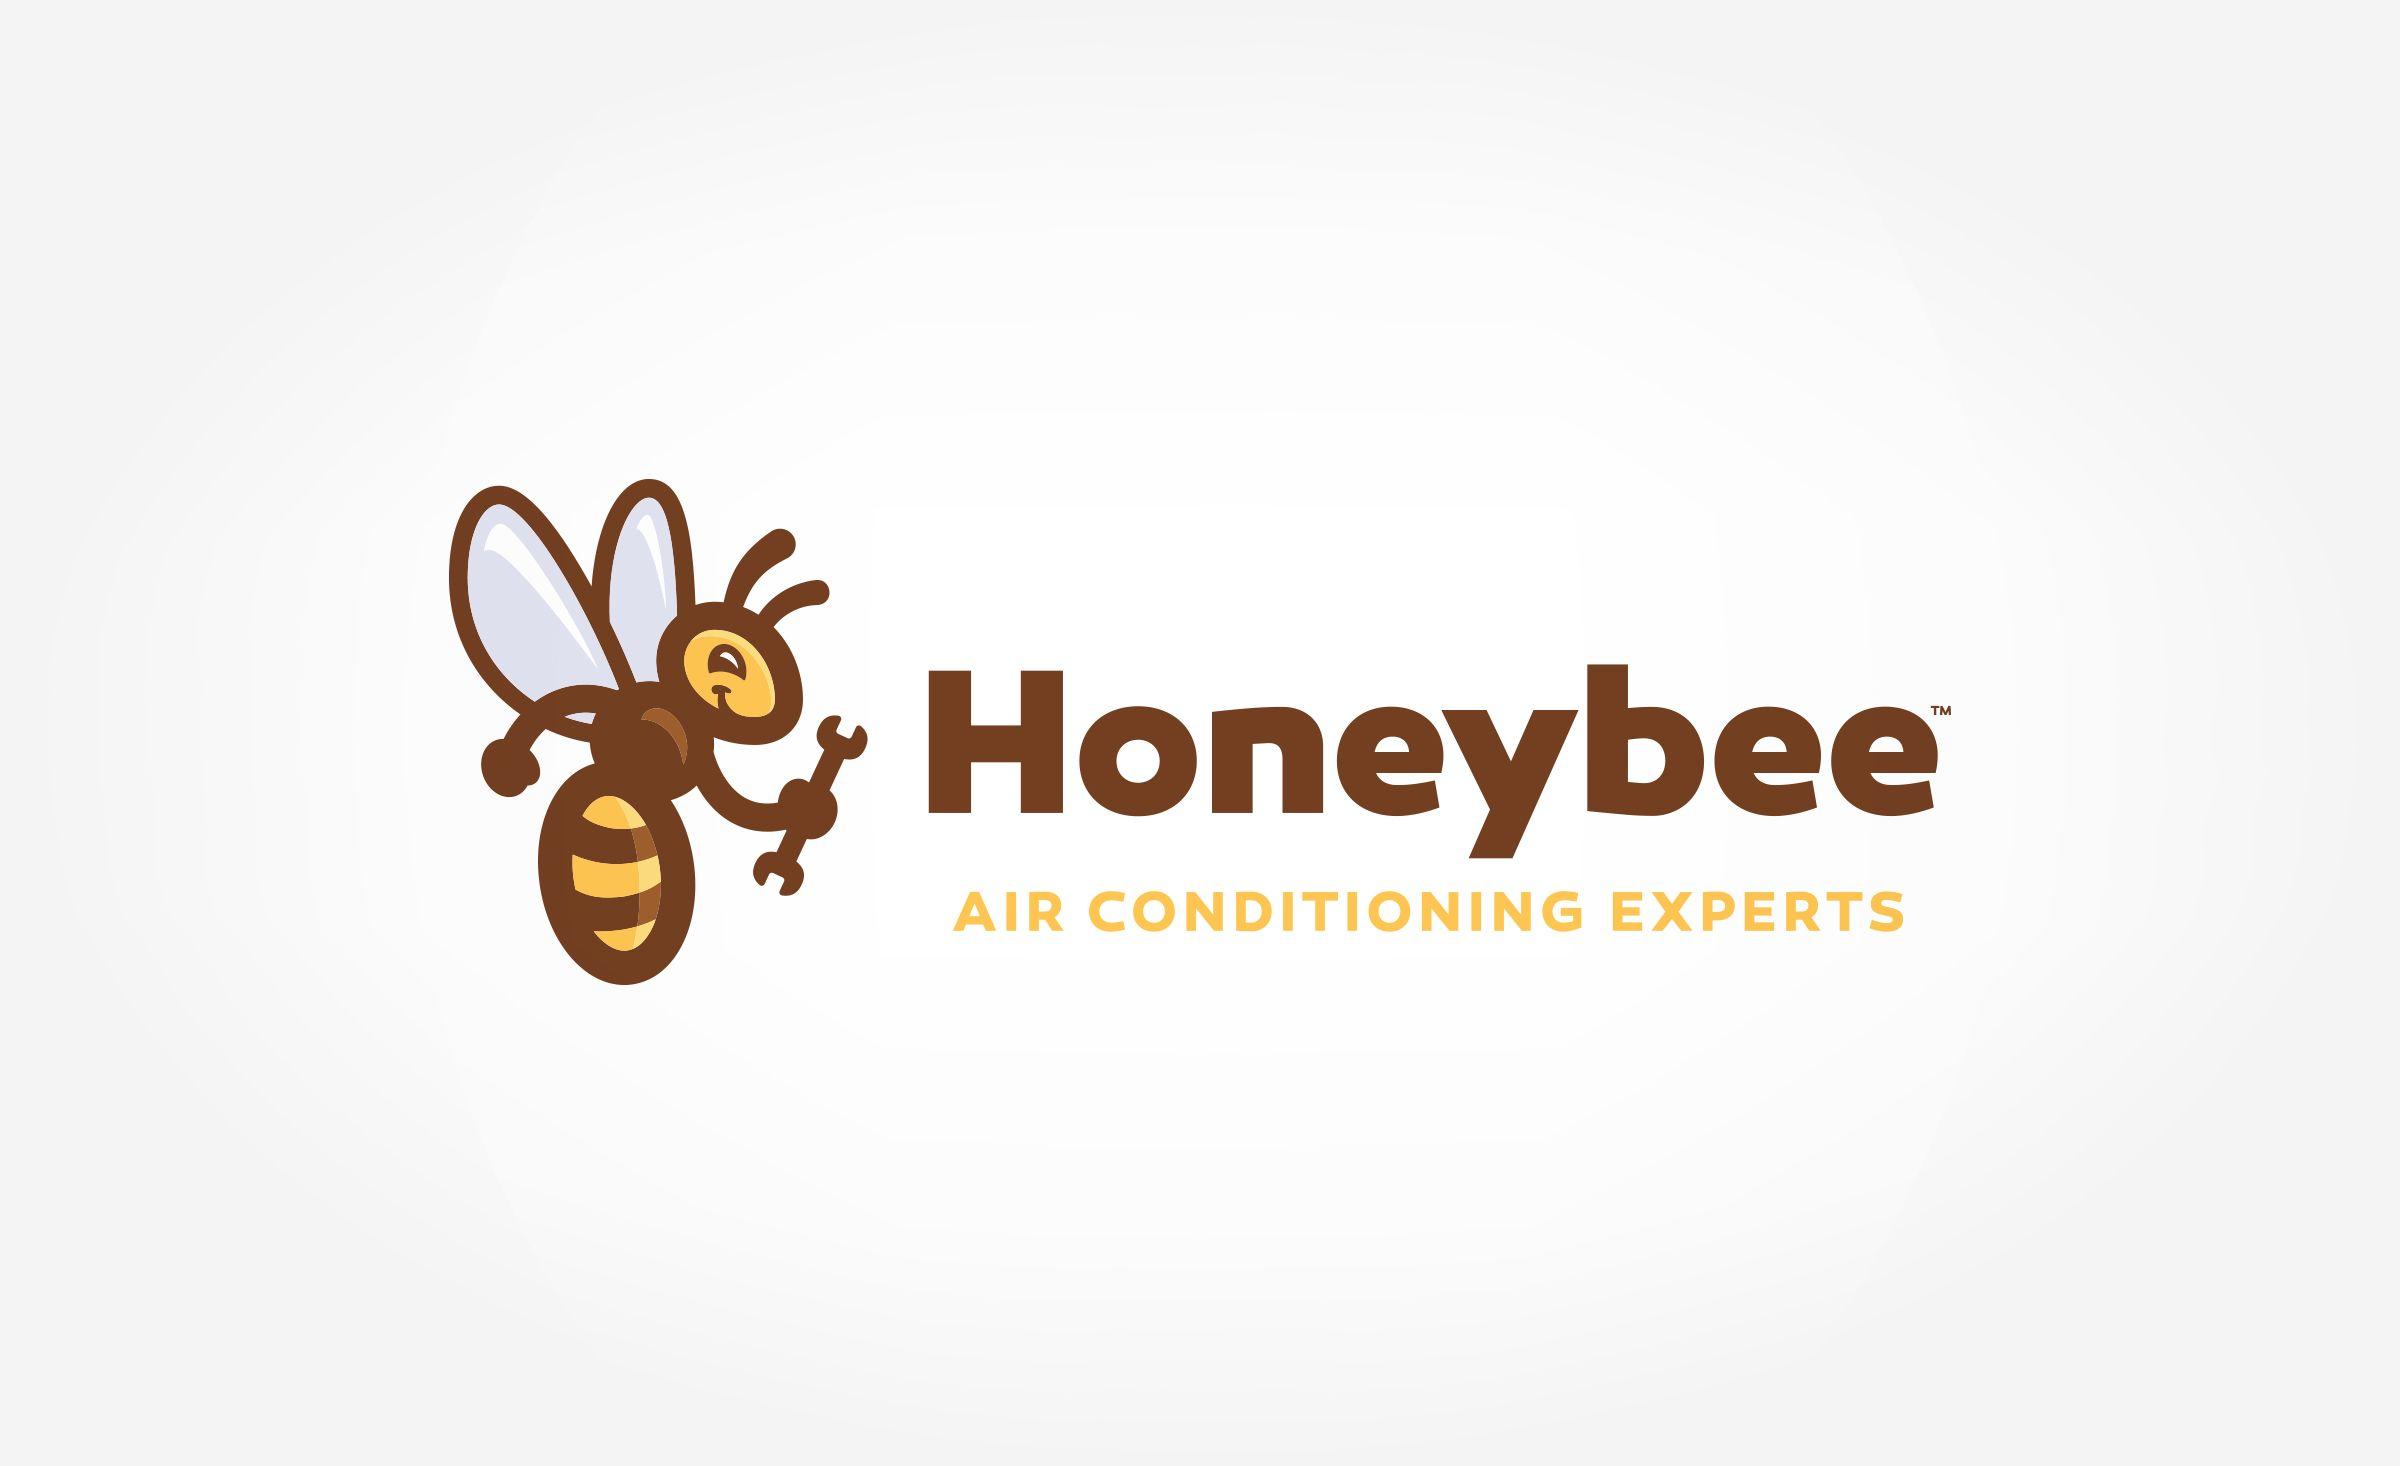 Http Cdn Graphicd Signs Com Wp Content Uploads 2014 10 Honeybee